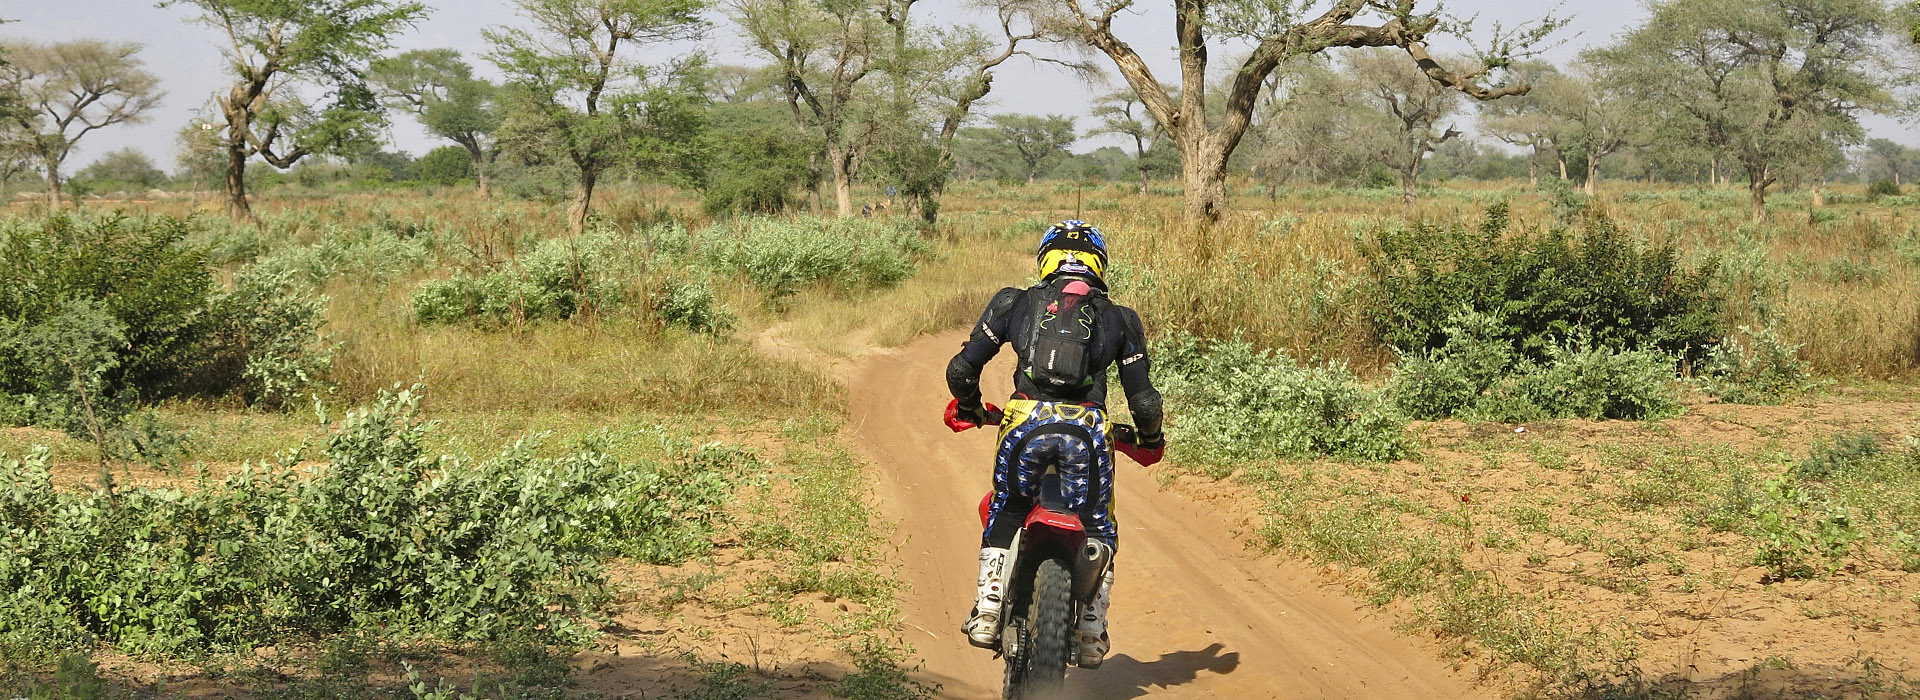 Offroad motorreis Sengela van Travel 2 Explore motorreizen in Afrika